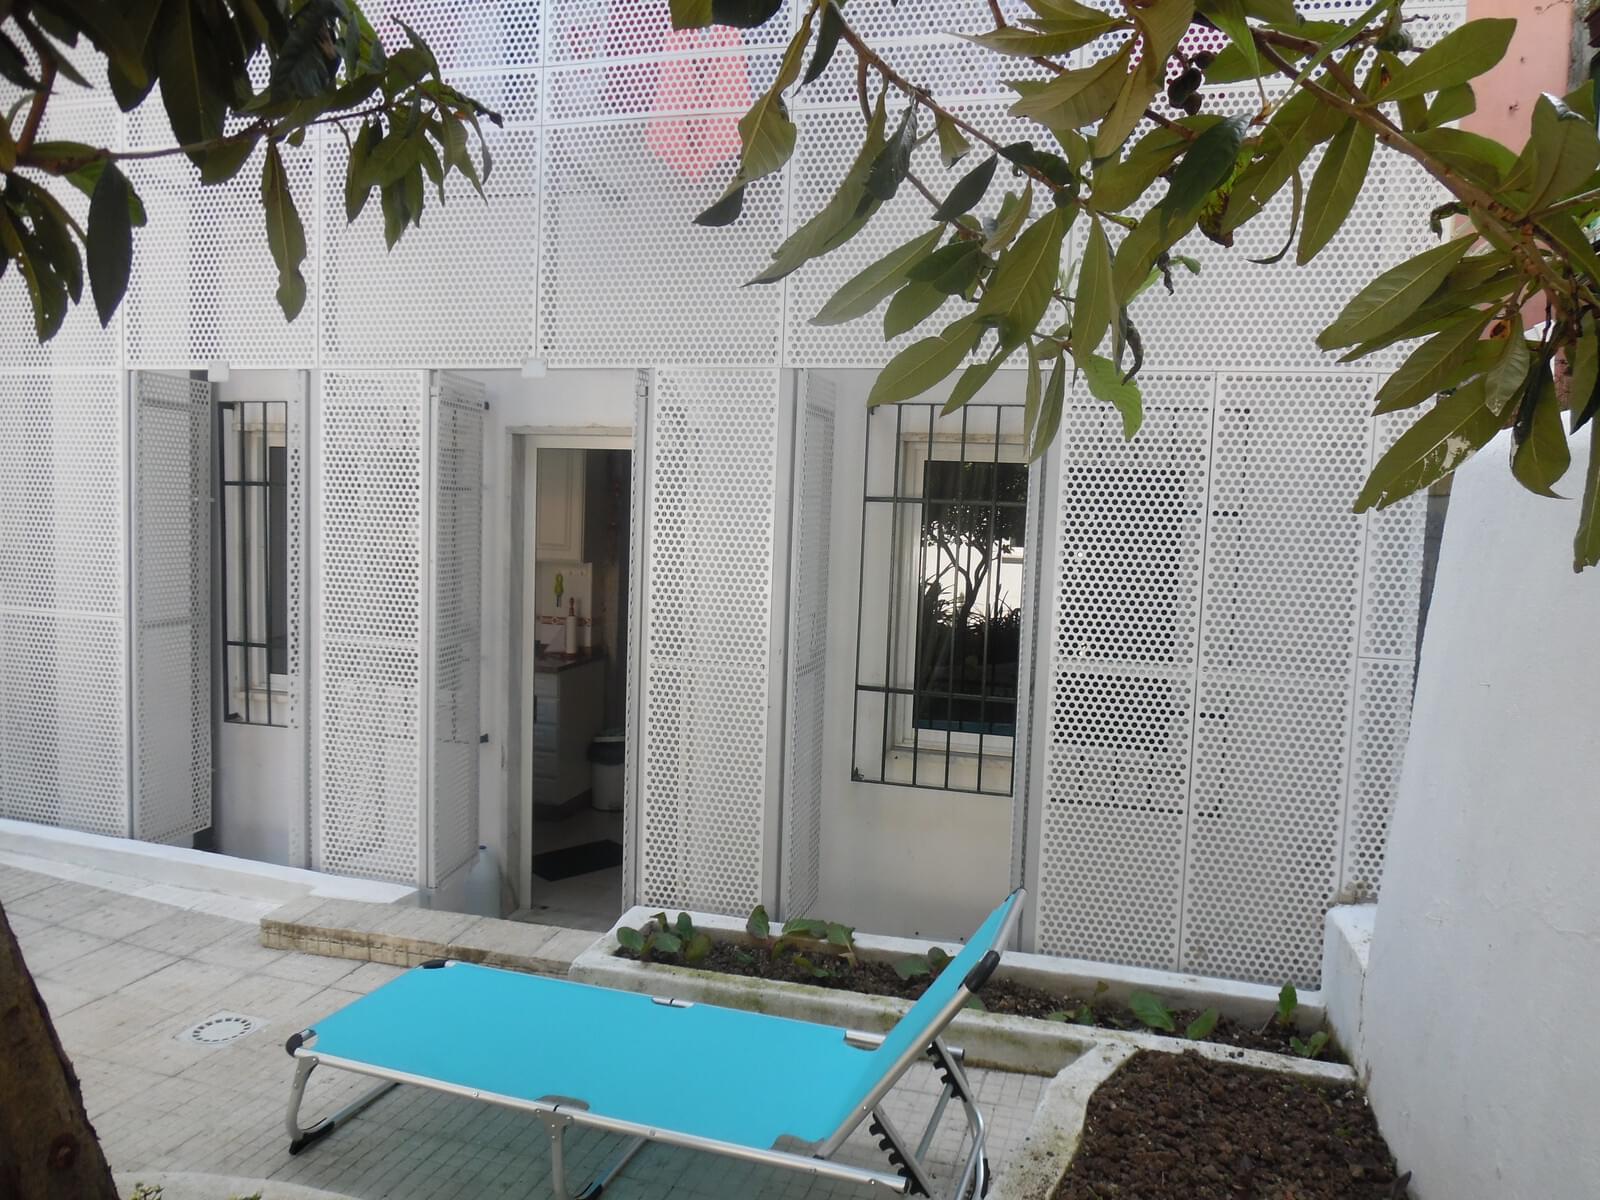 pf17147-apartamento-t2-lisboa-c9dd0f47-5125-466a-9542-6a5cb52b5961